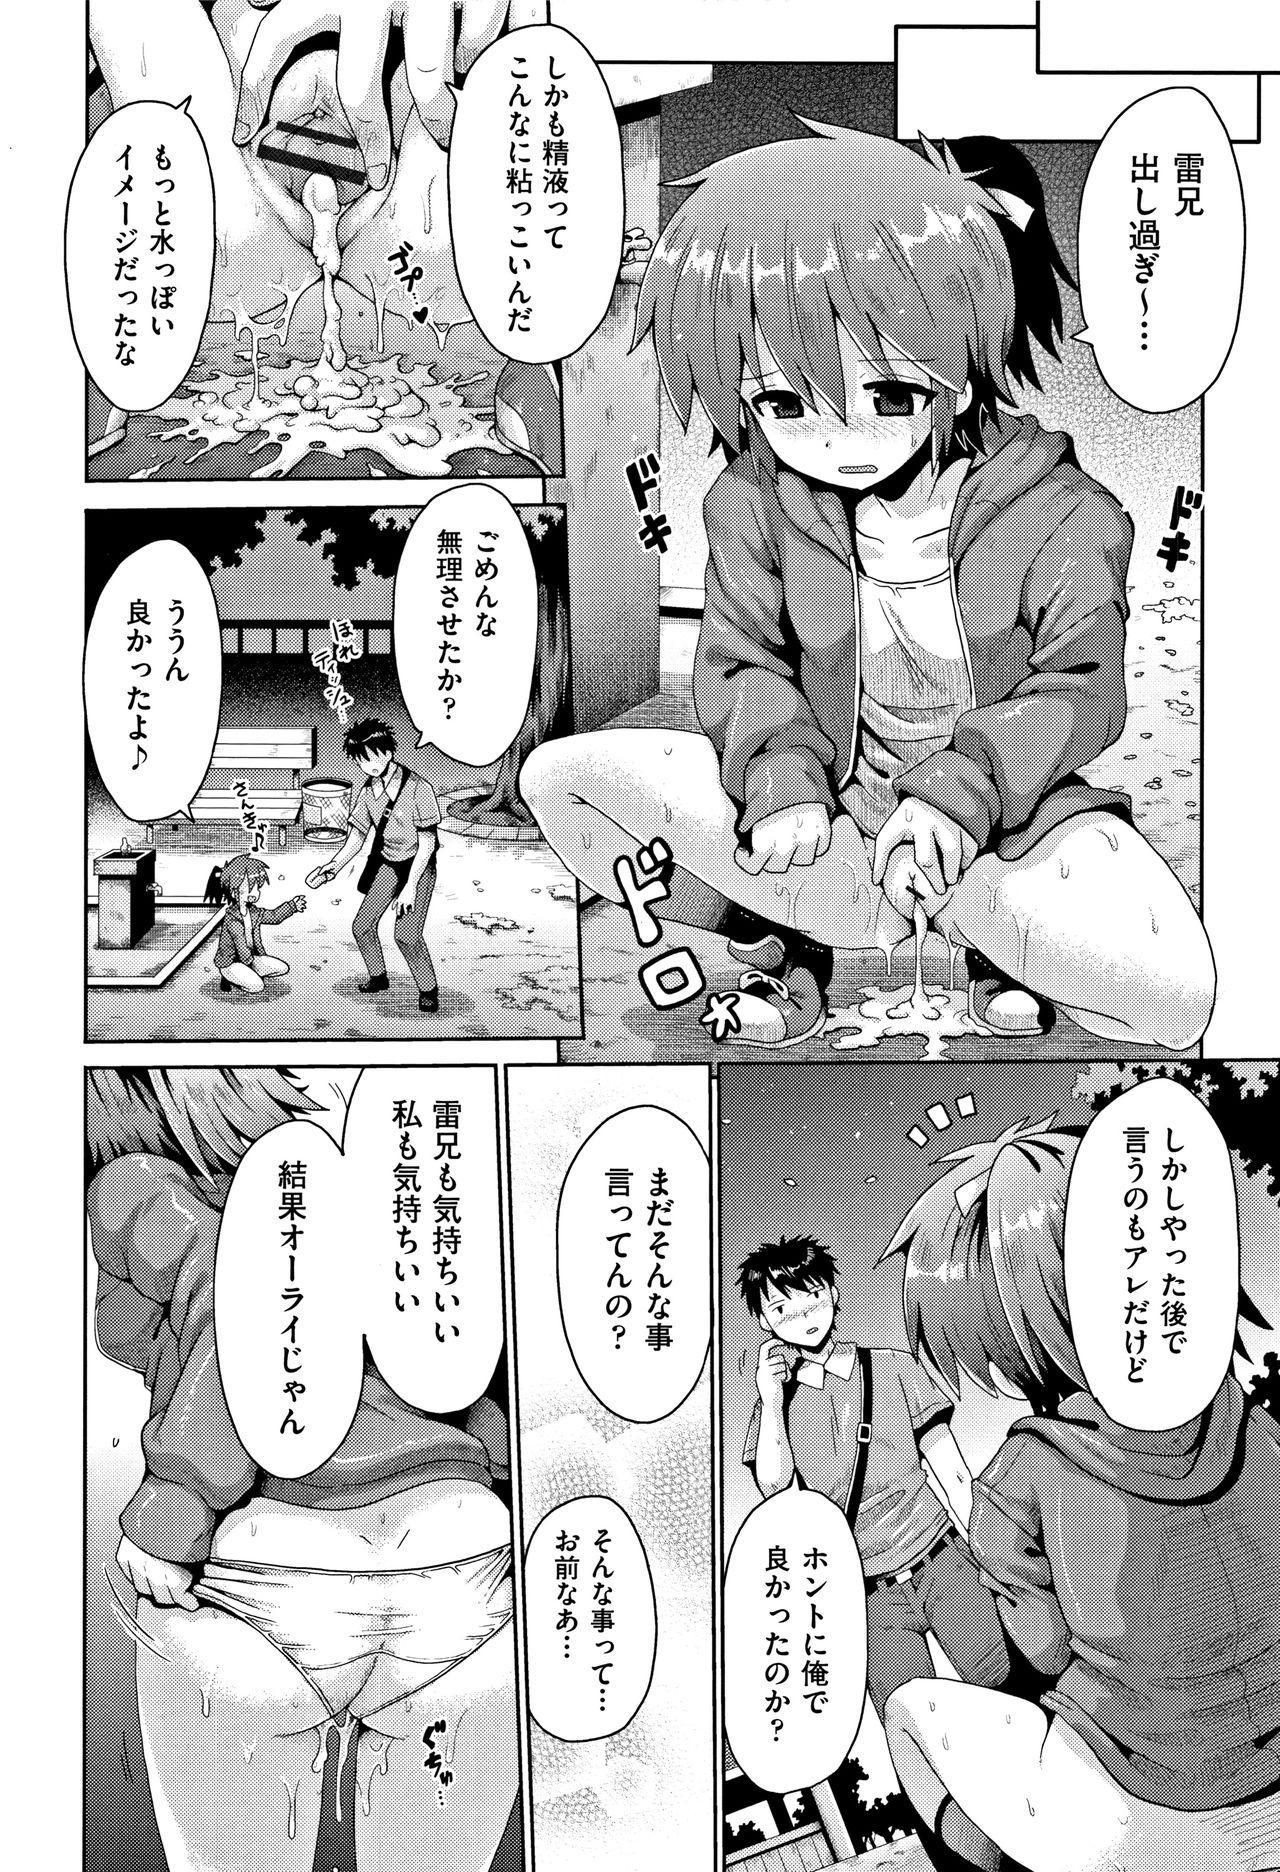 Kokugo Sansuu Rika Sex 28